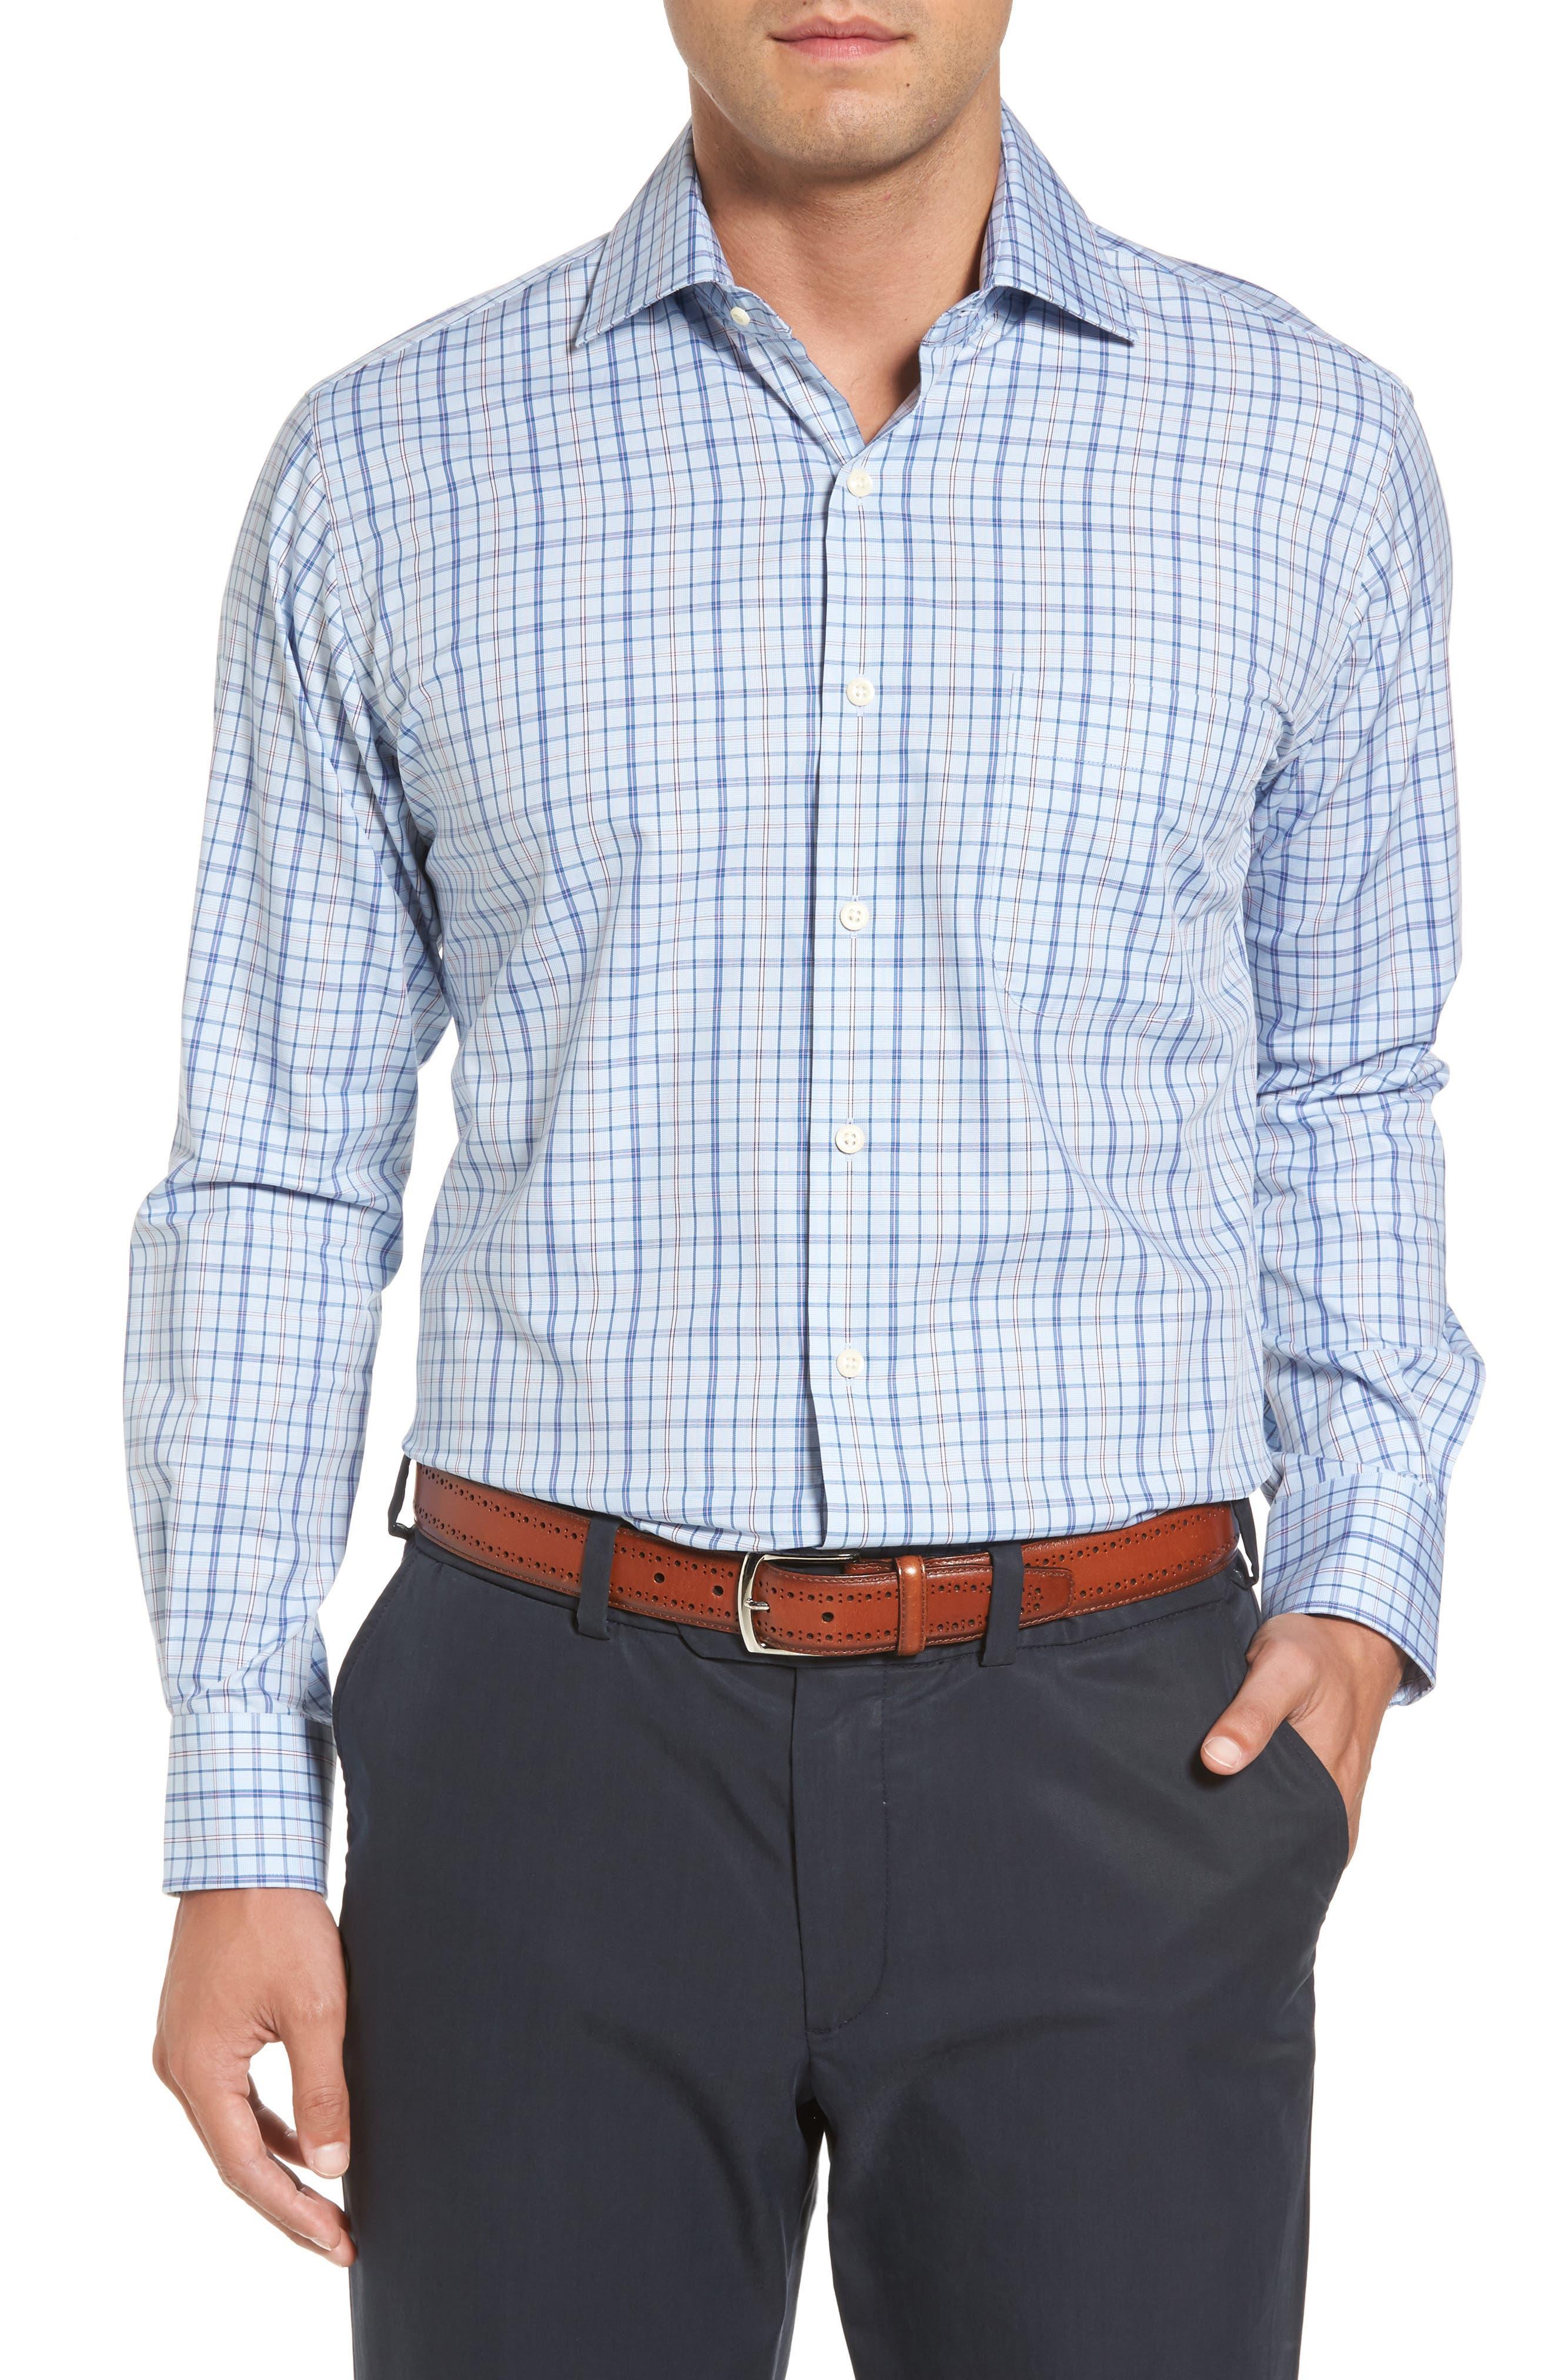 Main Image - Peter Millar Coastland Regular Fit Plaid Sport Shirt